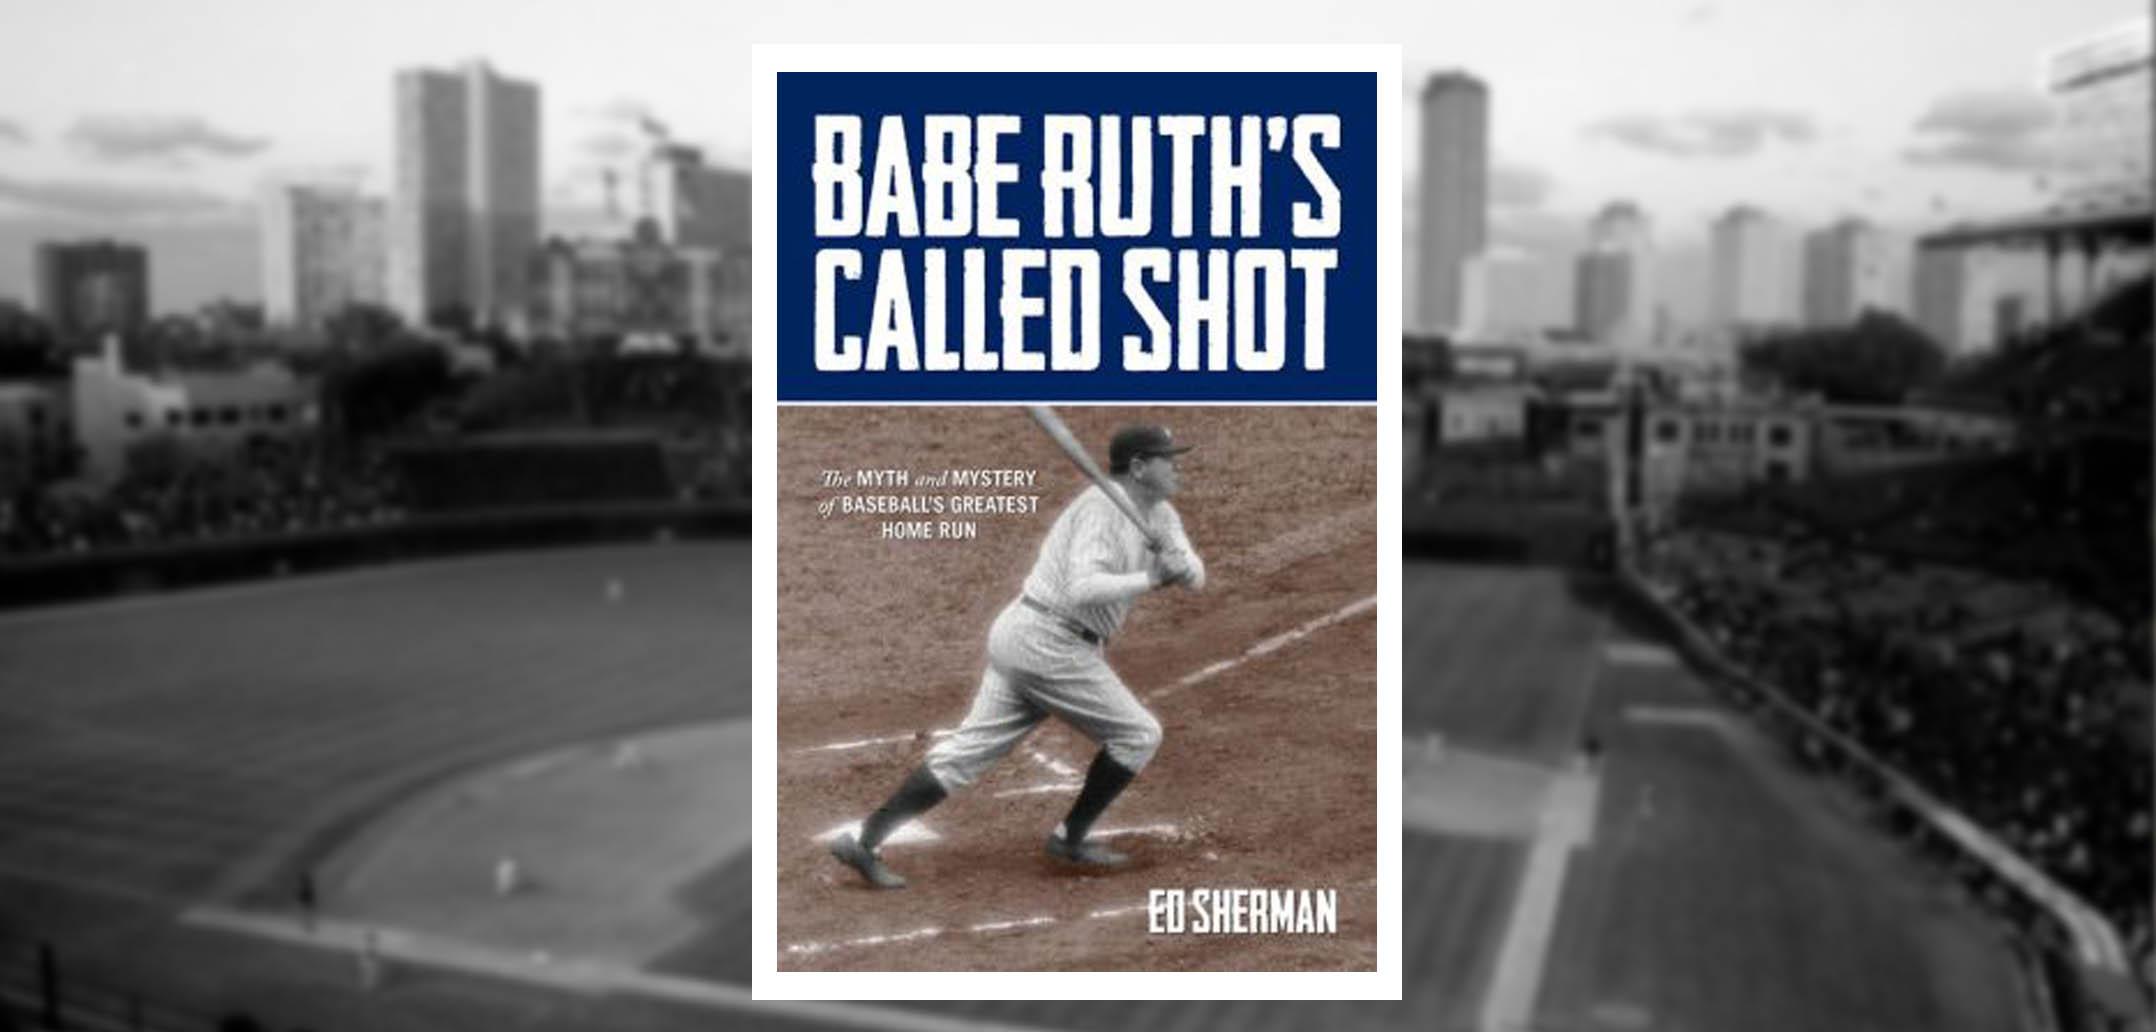 Greatest Home Run in Baseball History